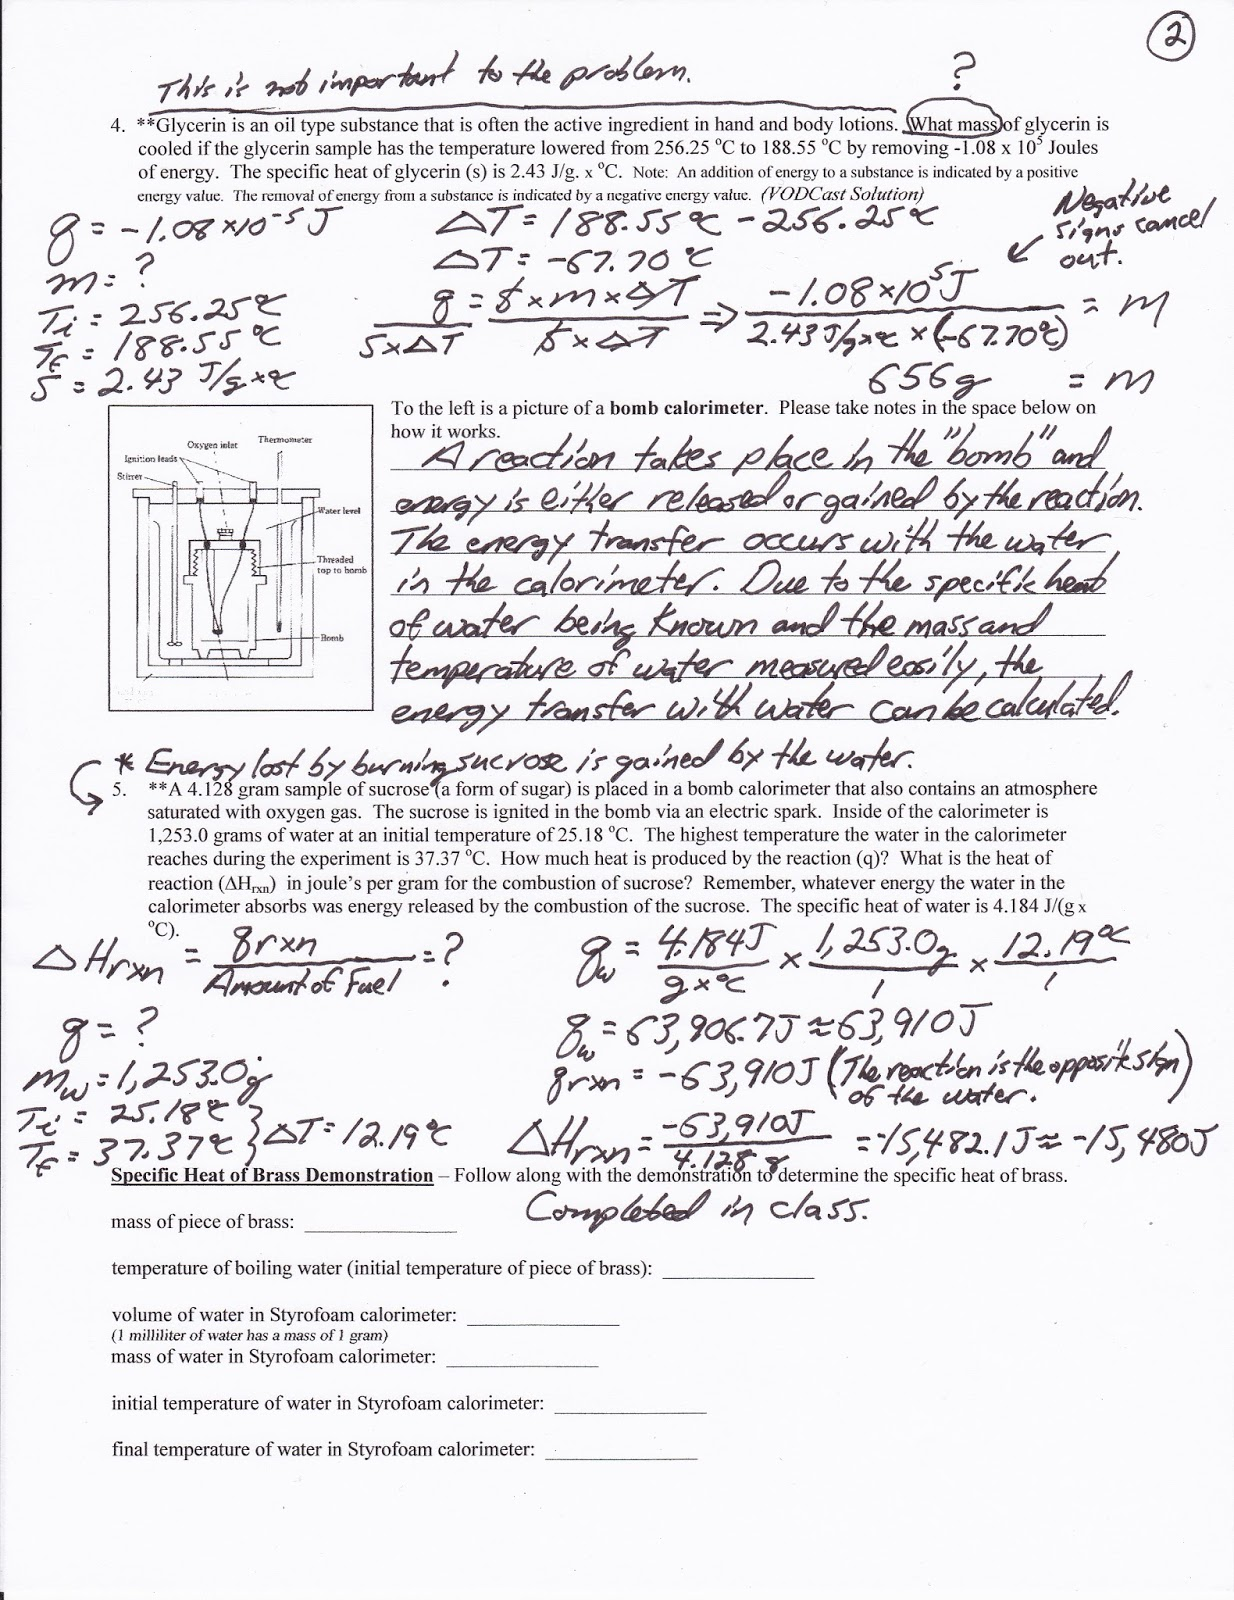 worksheet Calorimetry Worksheet 1 Answers calorimetry worksheet key adriaticatoursrl mr brueckner 2017 2018 chemistry blog october practice 1